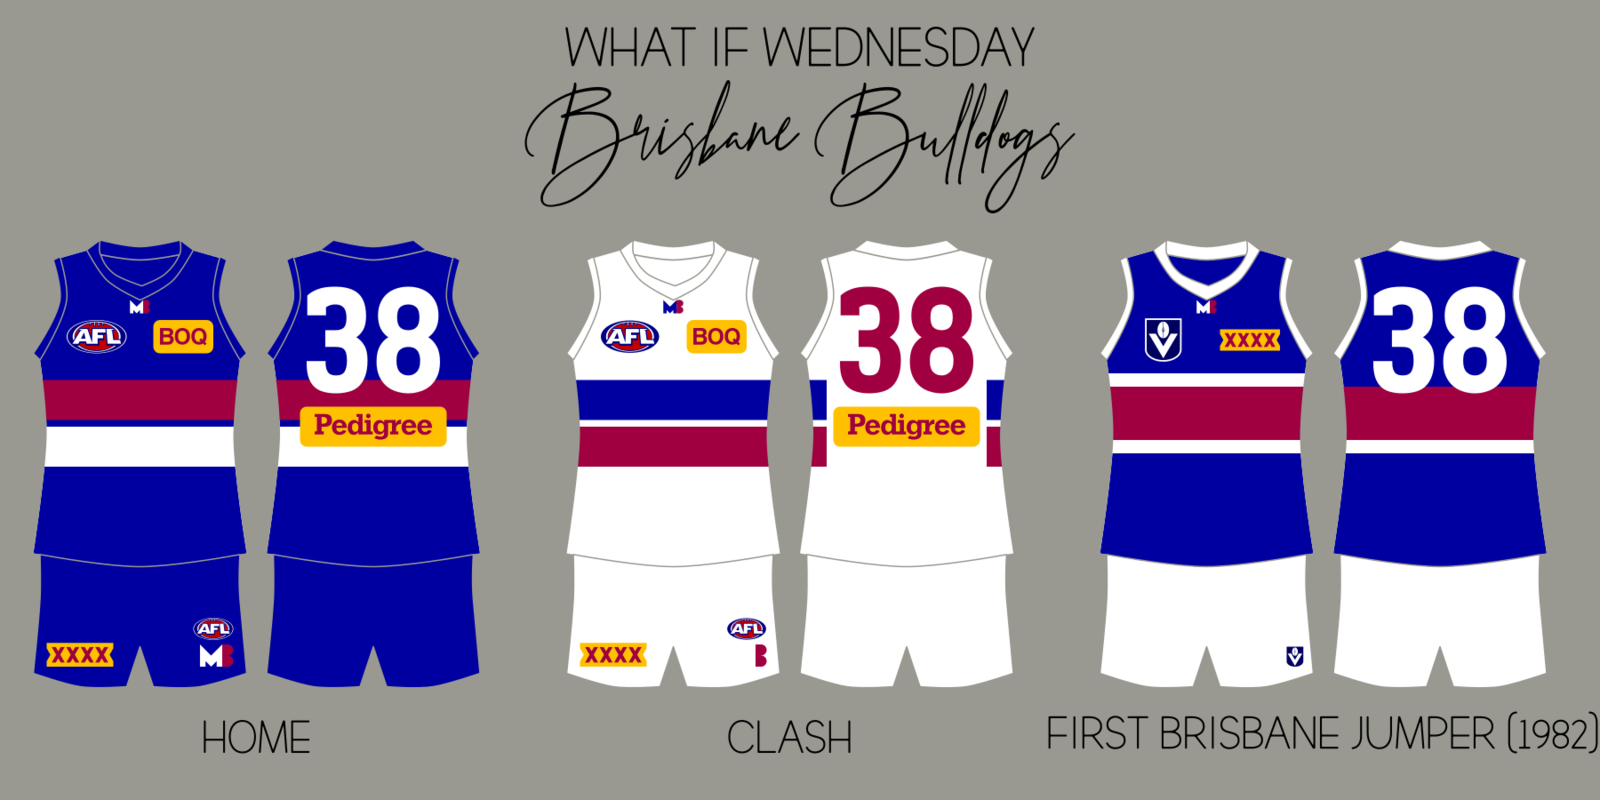 x14 Brisbane Bulldogs.png